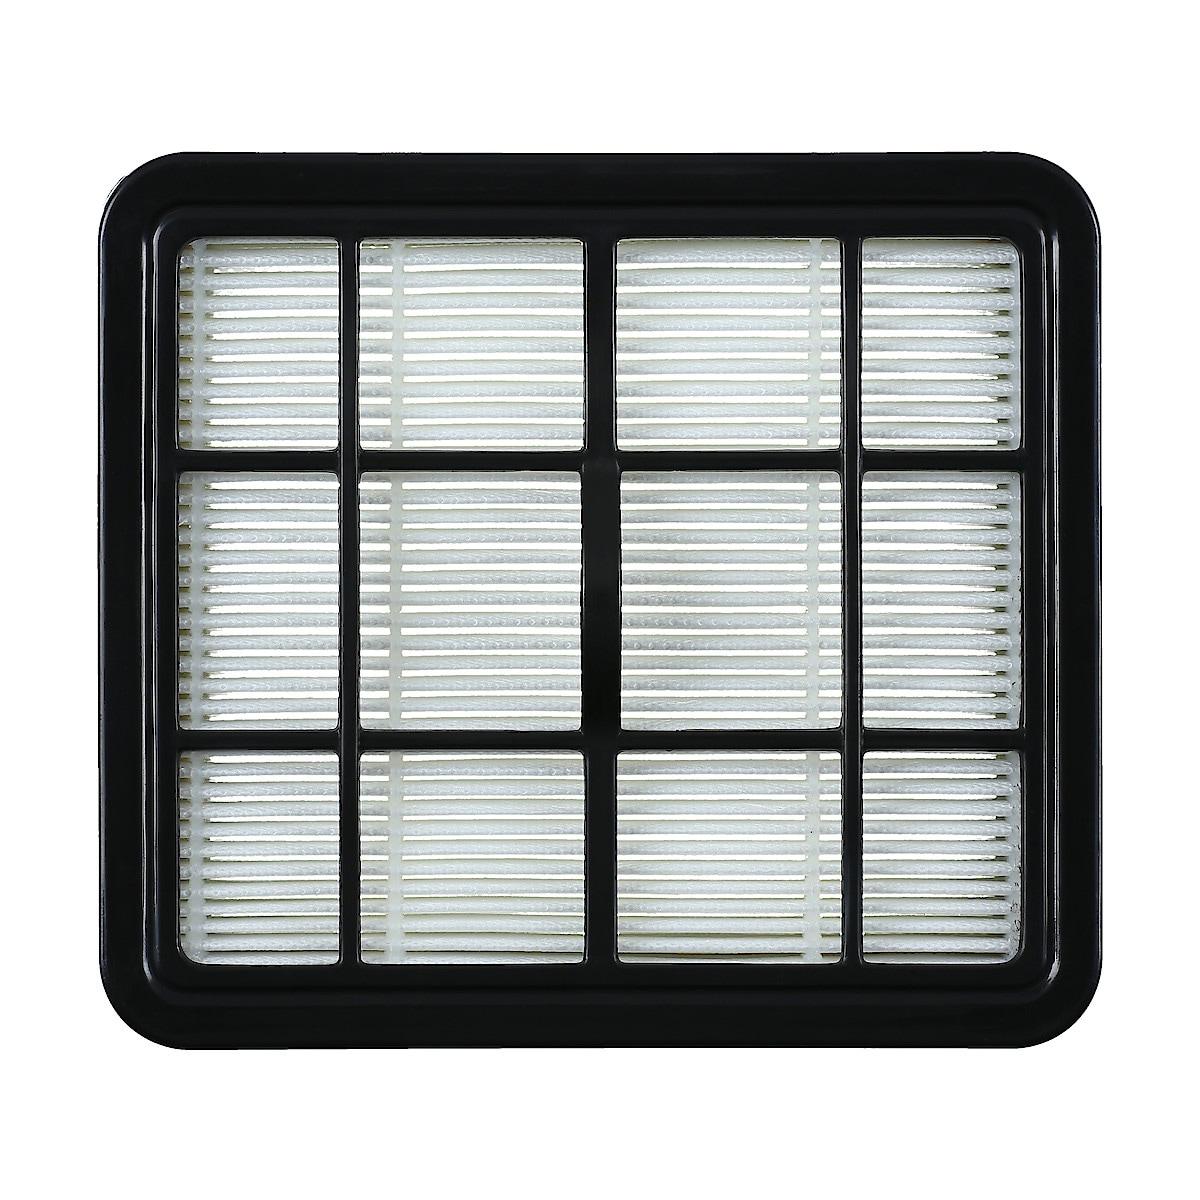 Coline HEPA-filter, 124 x 110 mm